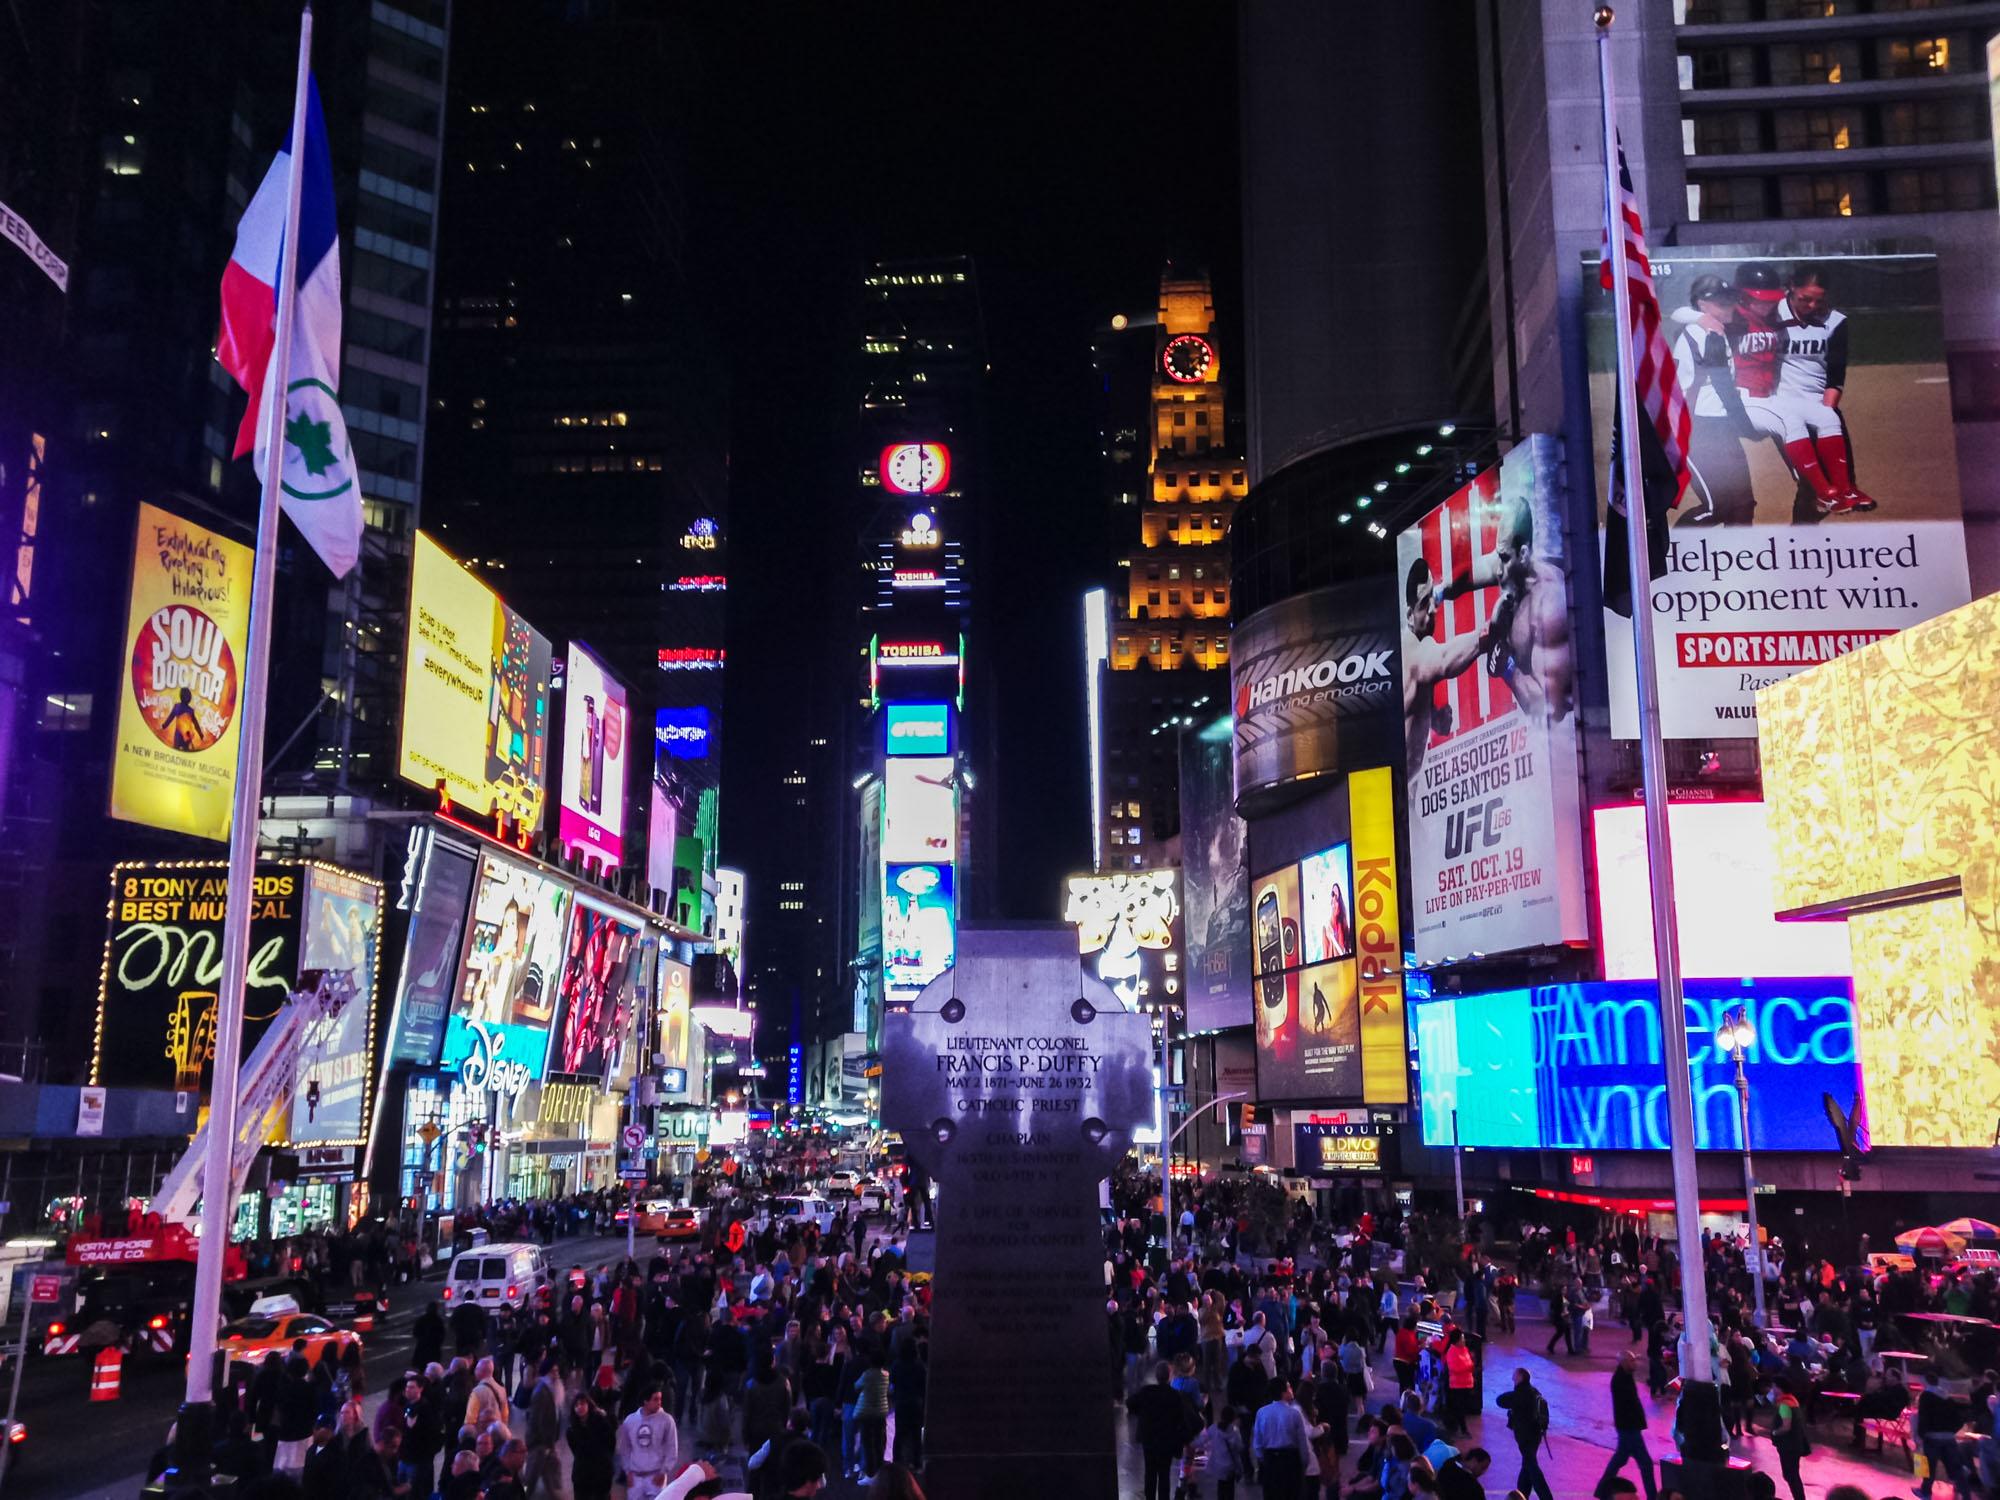 vamos-de-viaje-con-poc, persistencia o cambio, nueva york, road-trip-across-usa-never-sleep-never-ends, mar vidal, new york city, estados unidos, EEUU, usa, viaje, viajar